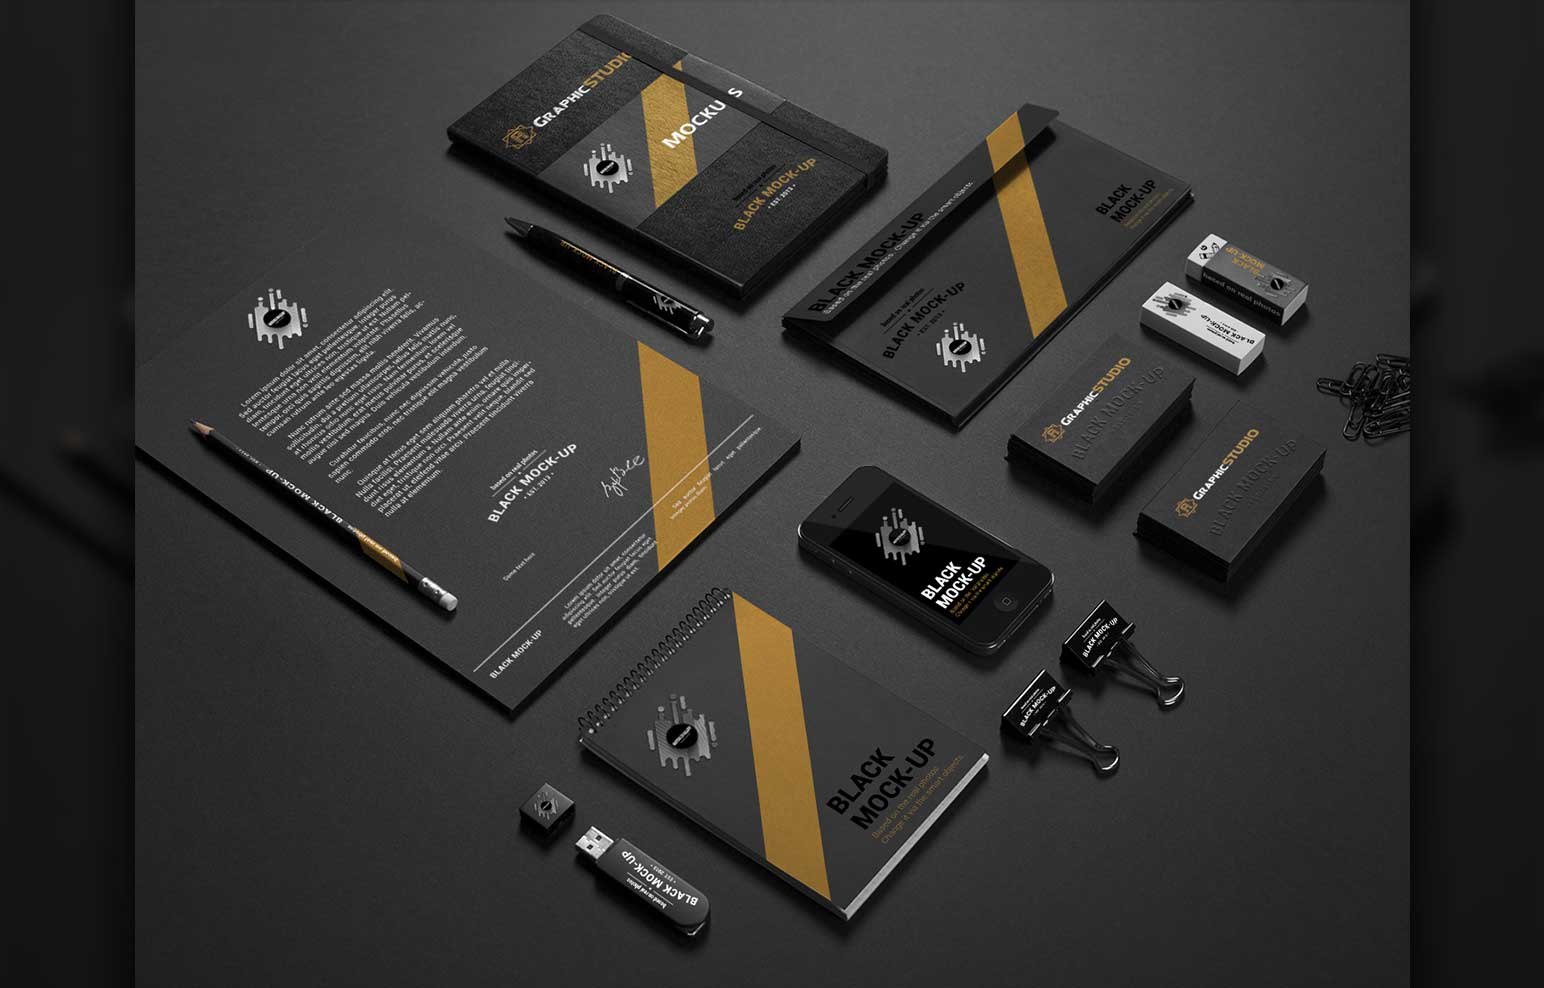 Personalizirana kancelariska oprema - Graficki dizajn, Персонализирана канцелариска опрема - Графички дизајн